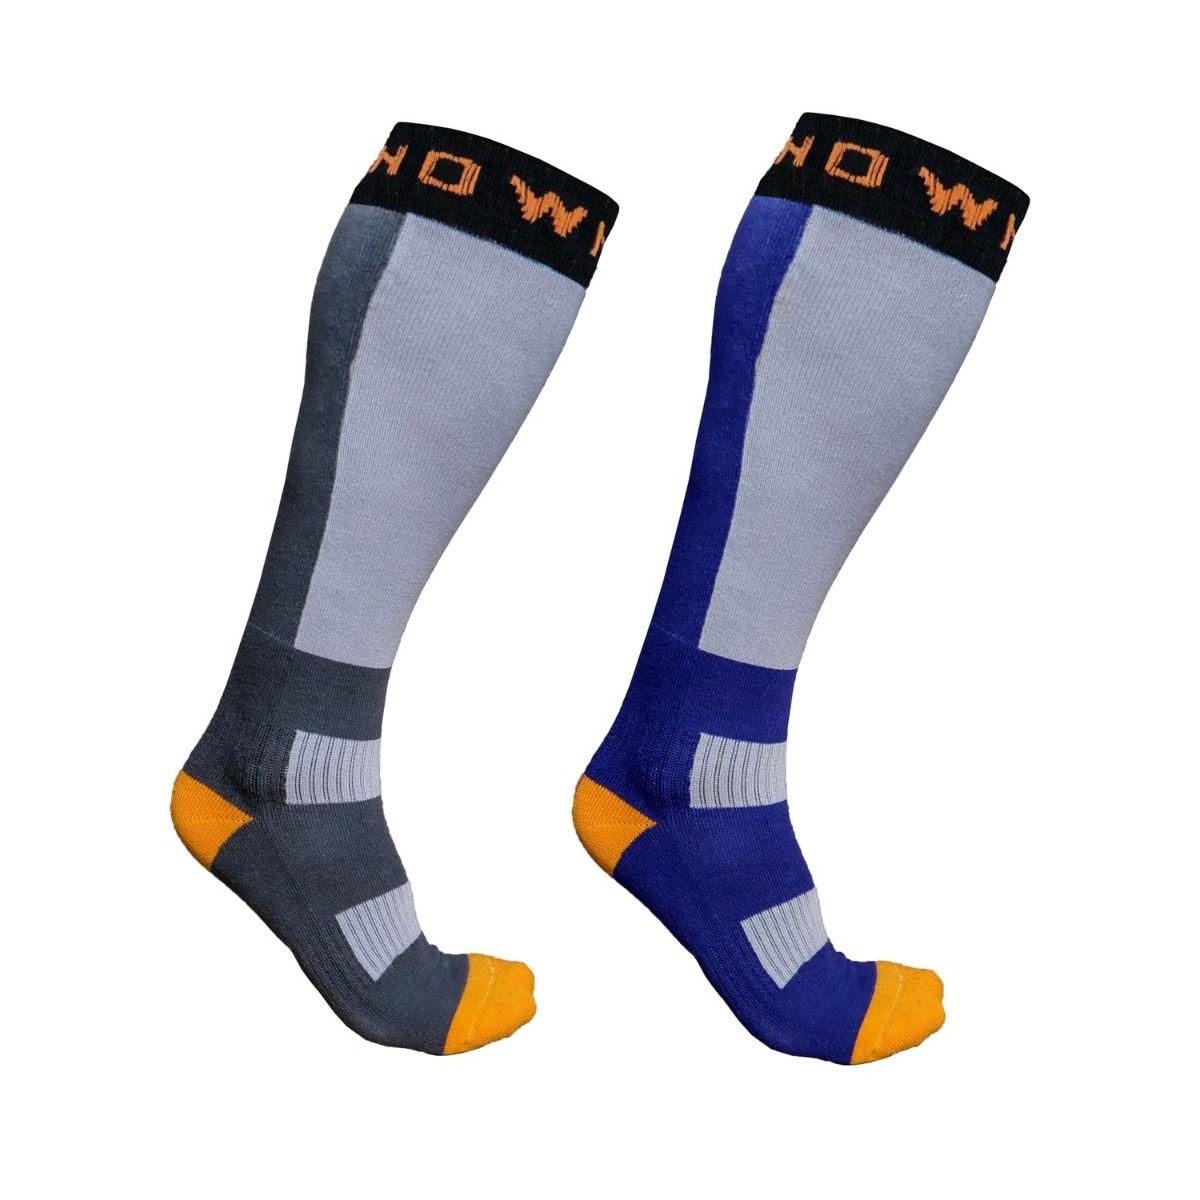 Package - 2 x Thermal Nuclear Ski Socks